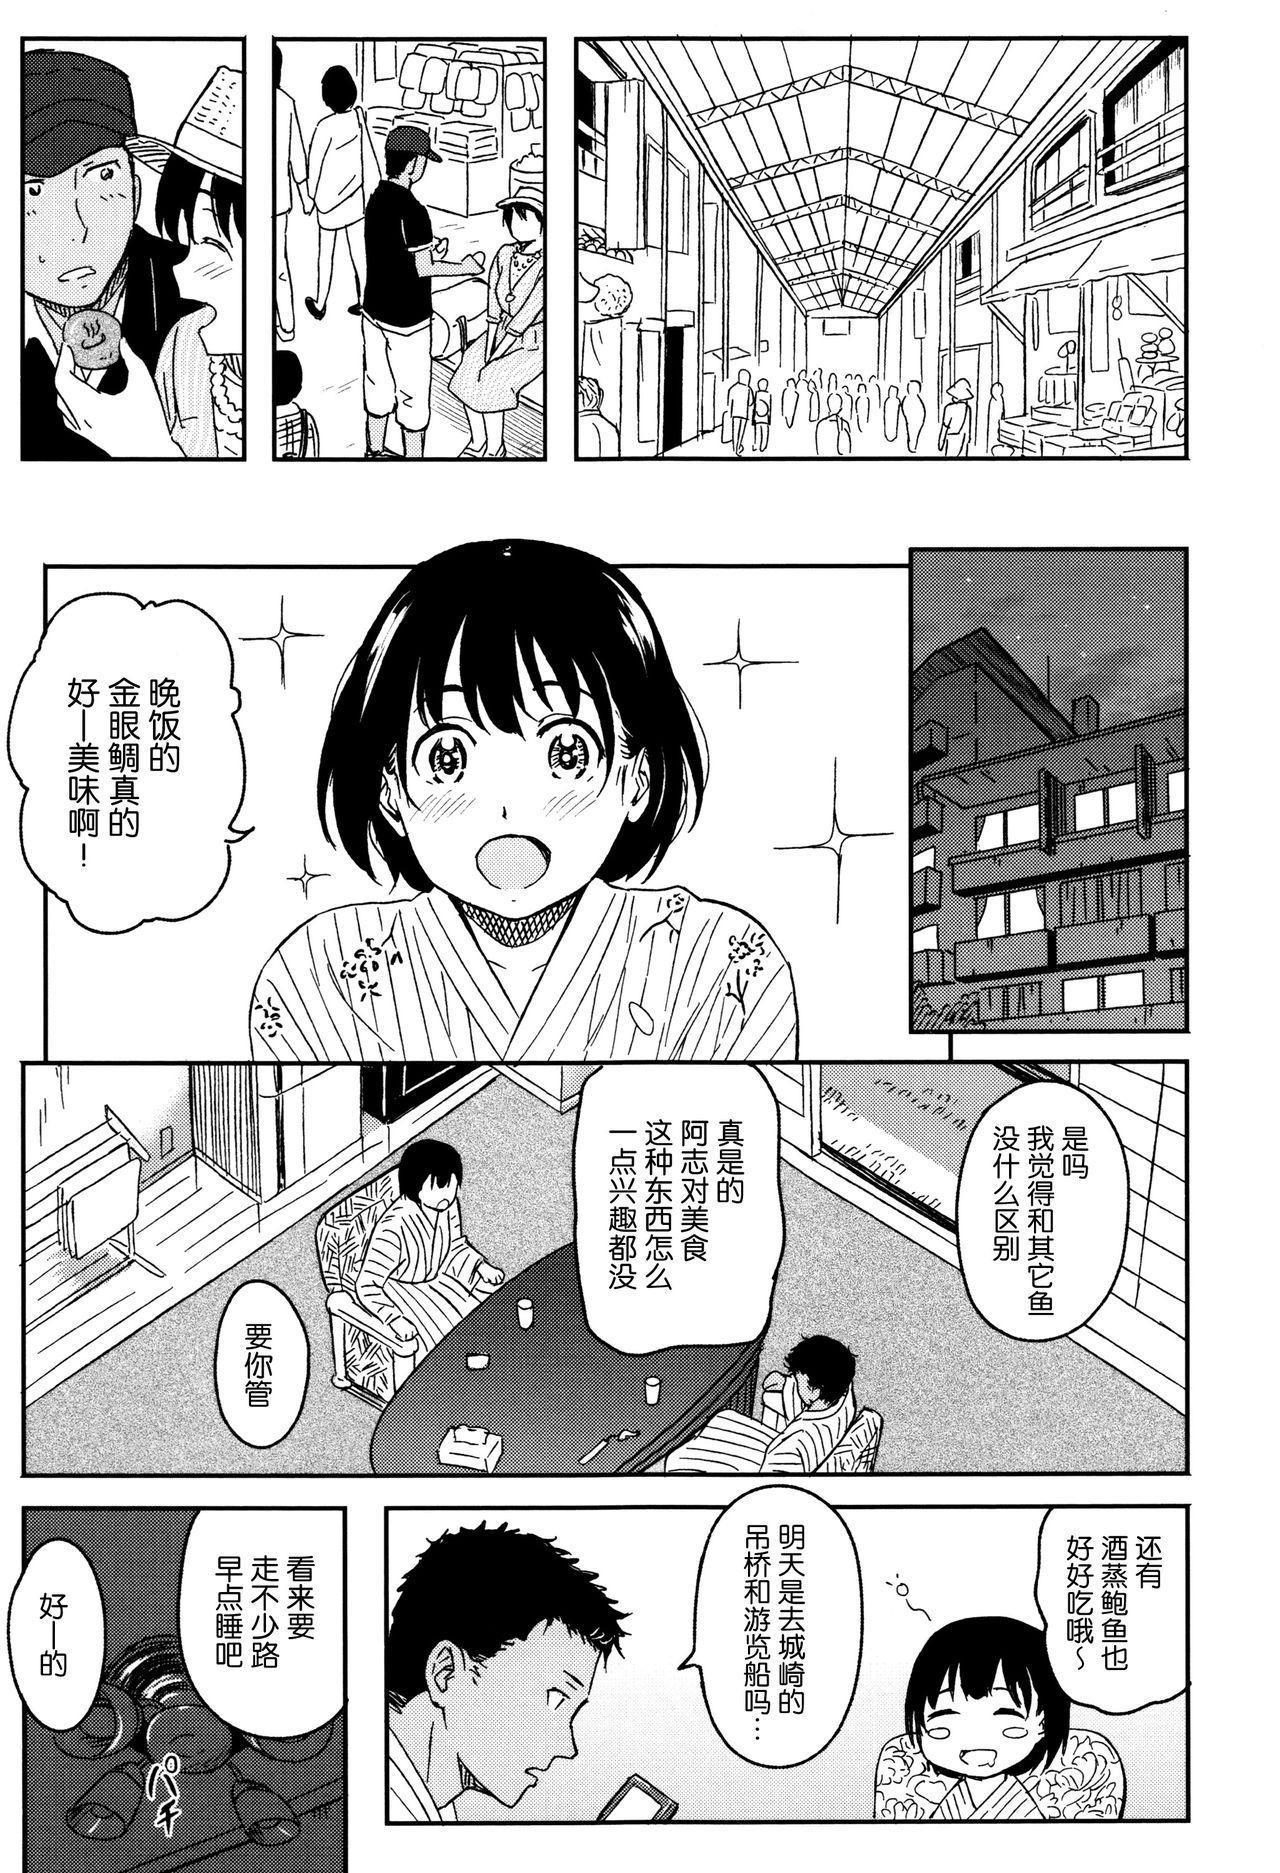 Tokubetsu na Mainichi - Special daily 183